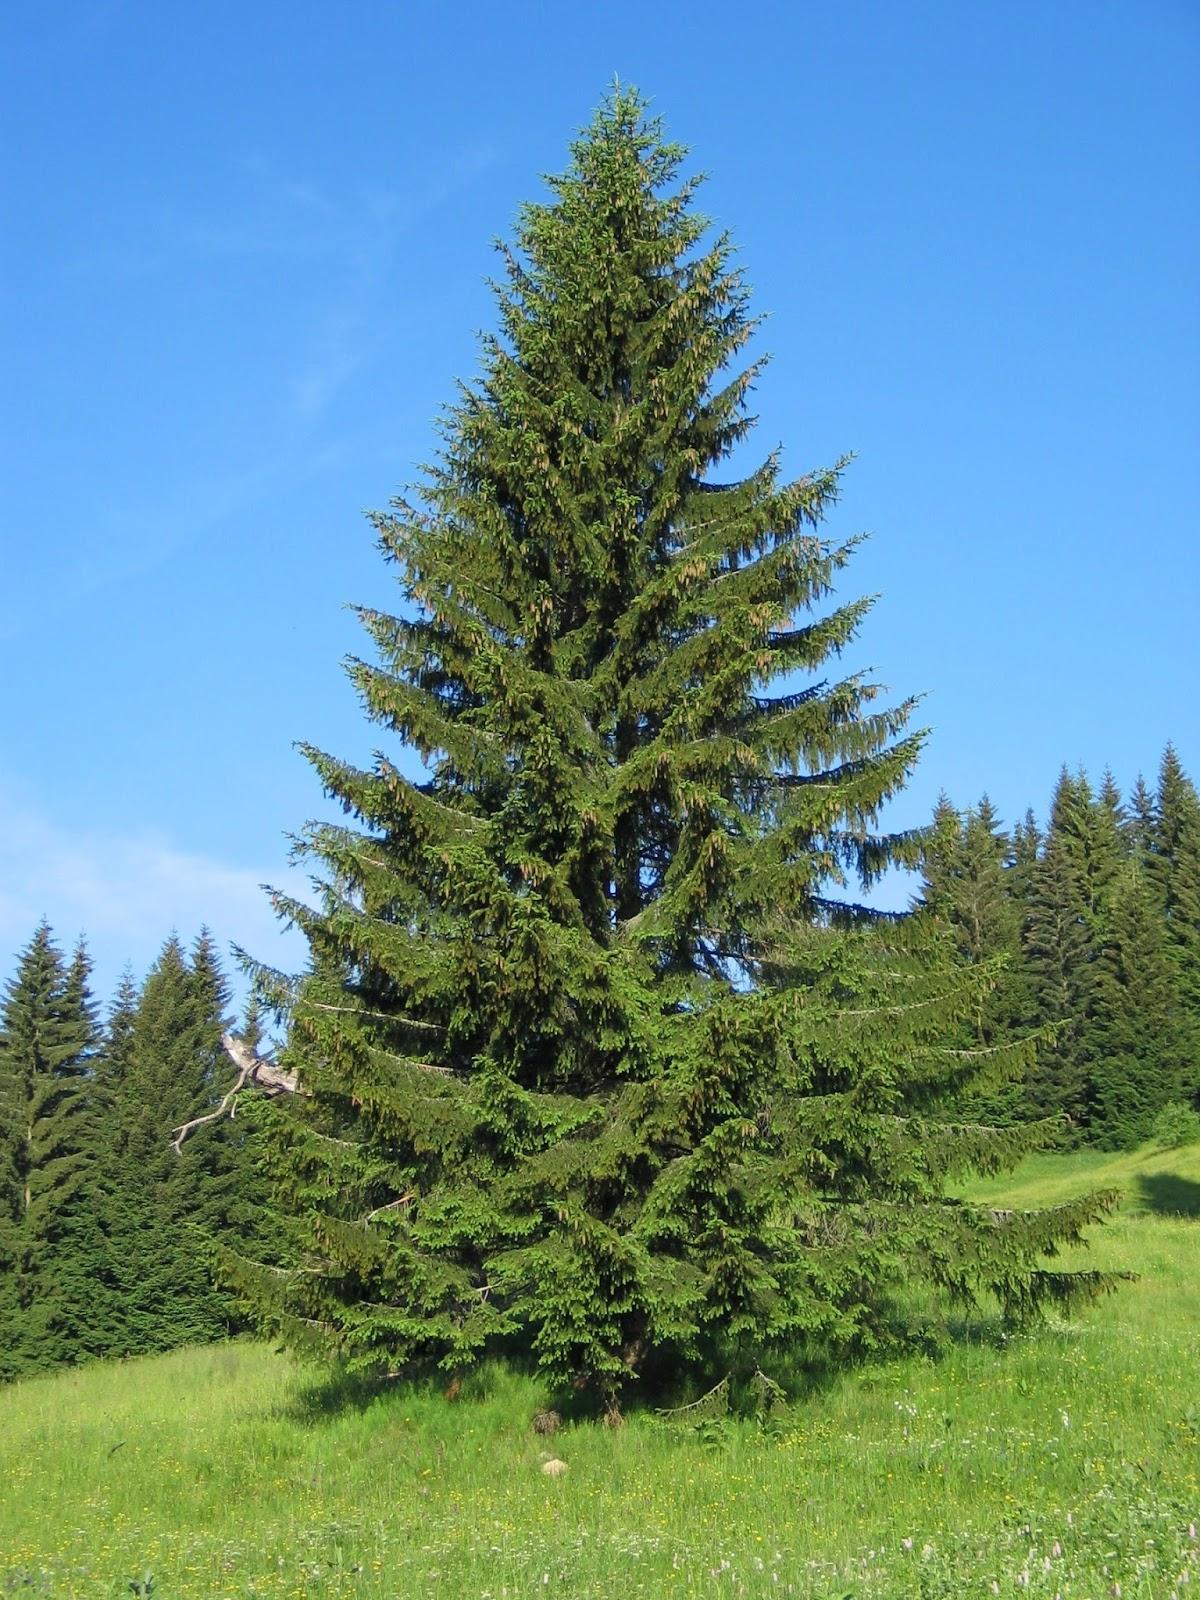 Picea abies norway spruce picea abies norway spruce picea abies